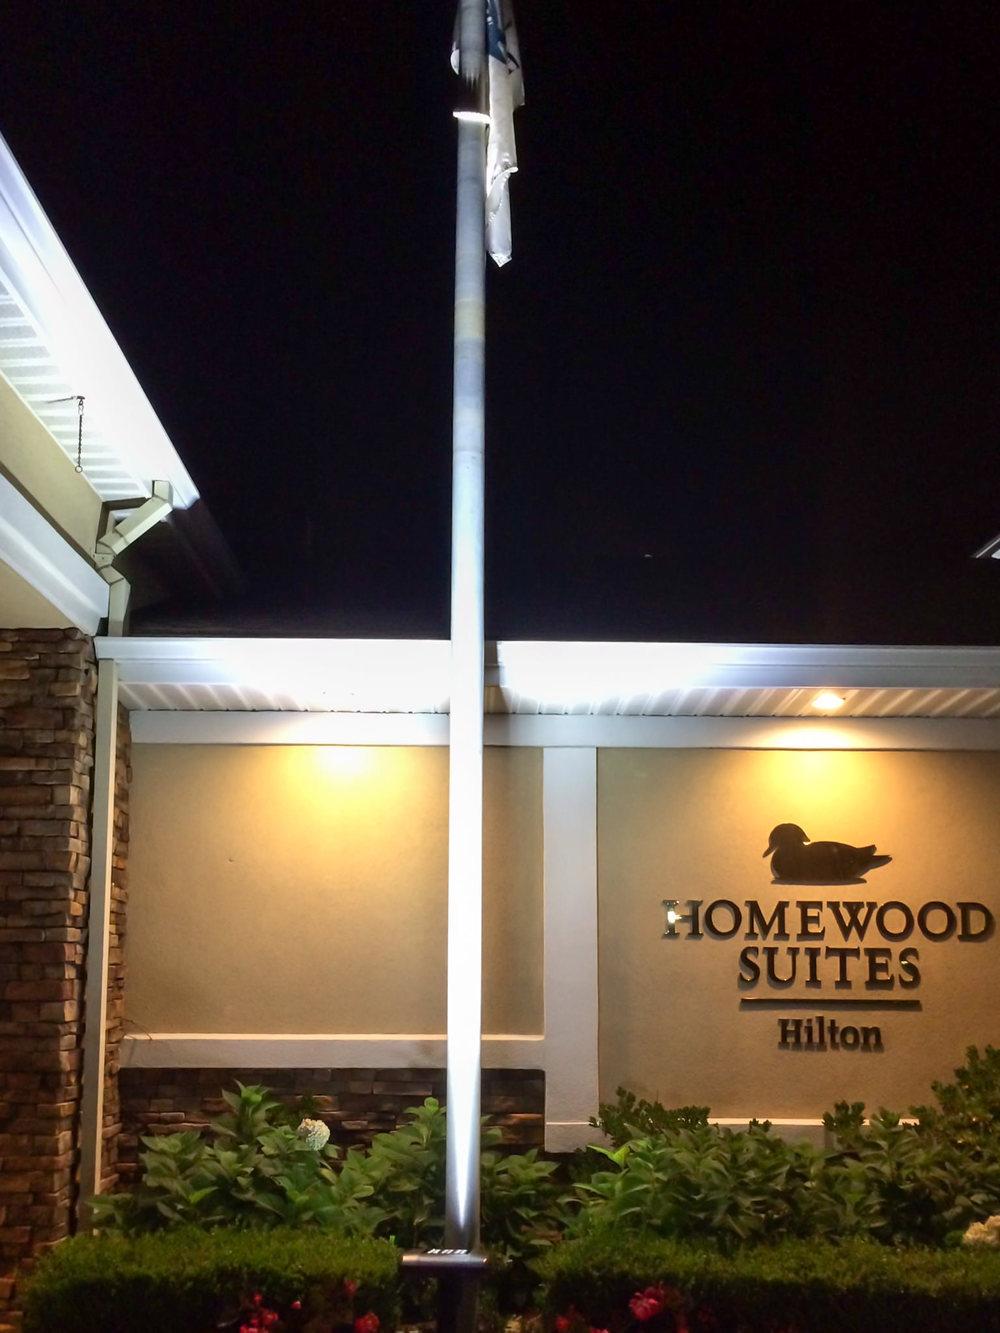 Hilton Homewood Suites ComPower LED 3-4.jpg